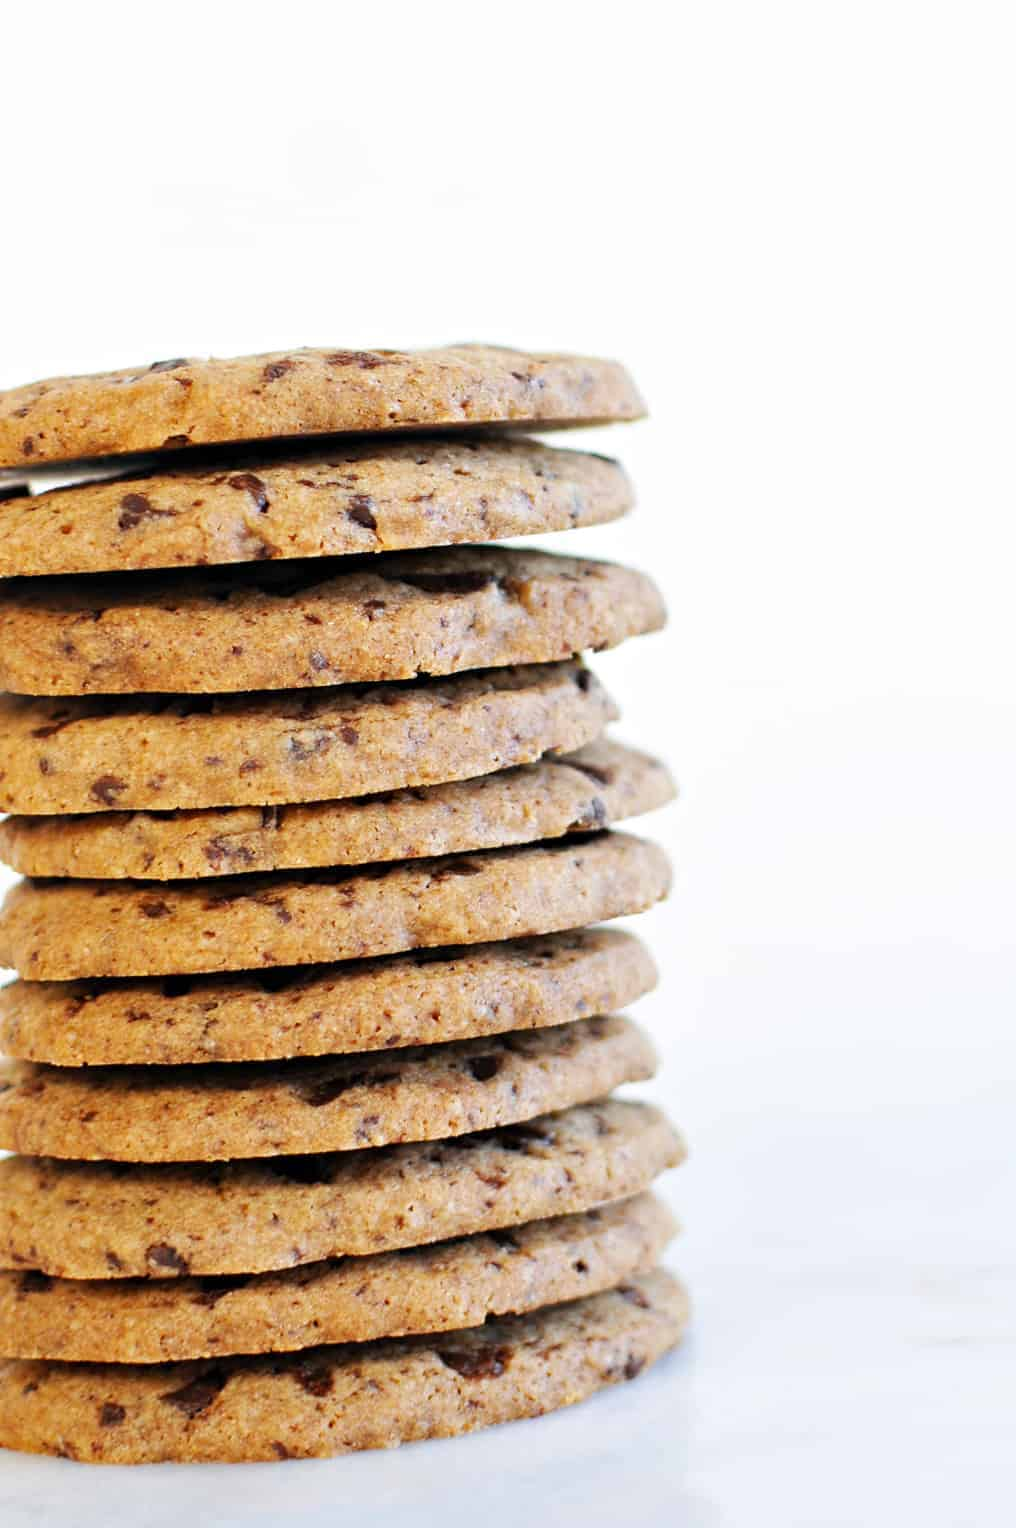 Chocolate Chip Cookie Crisps (via thepigandquill.com) #vegan #glutenfree #baking #dessert